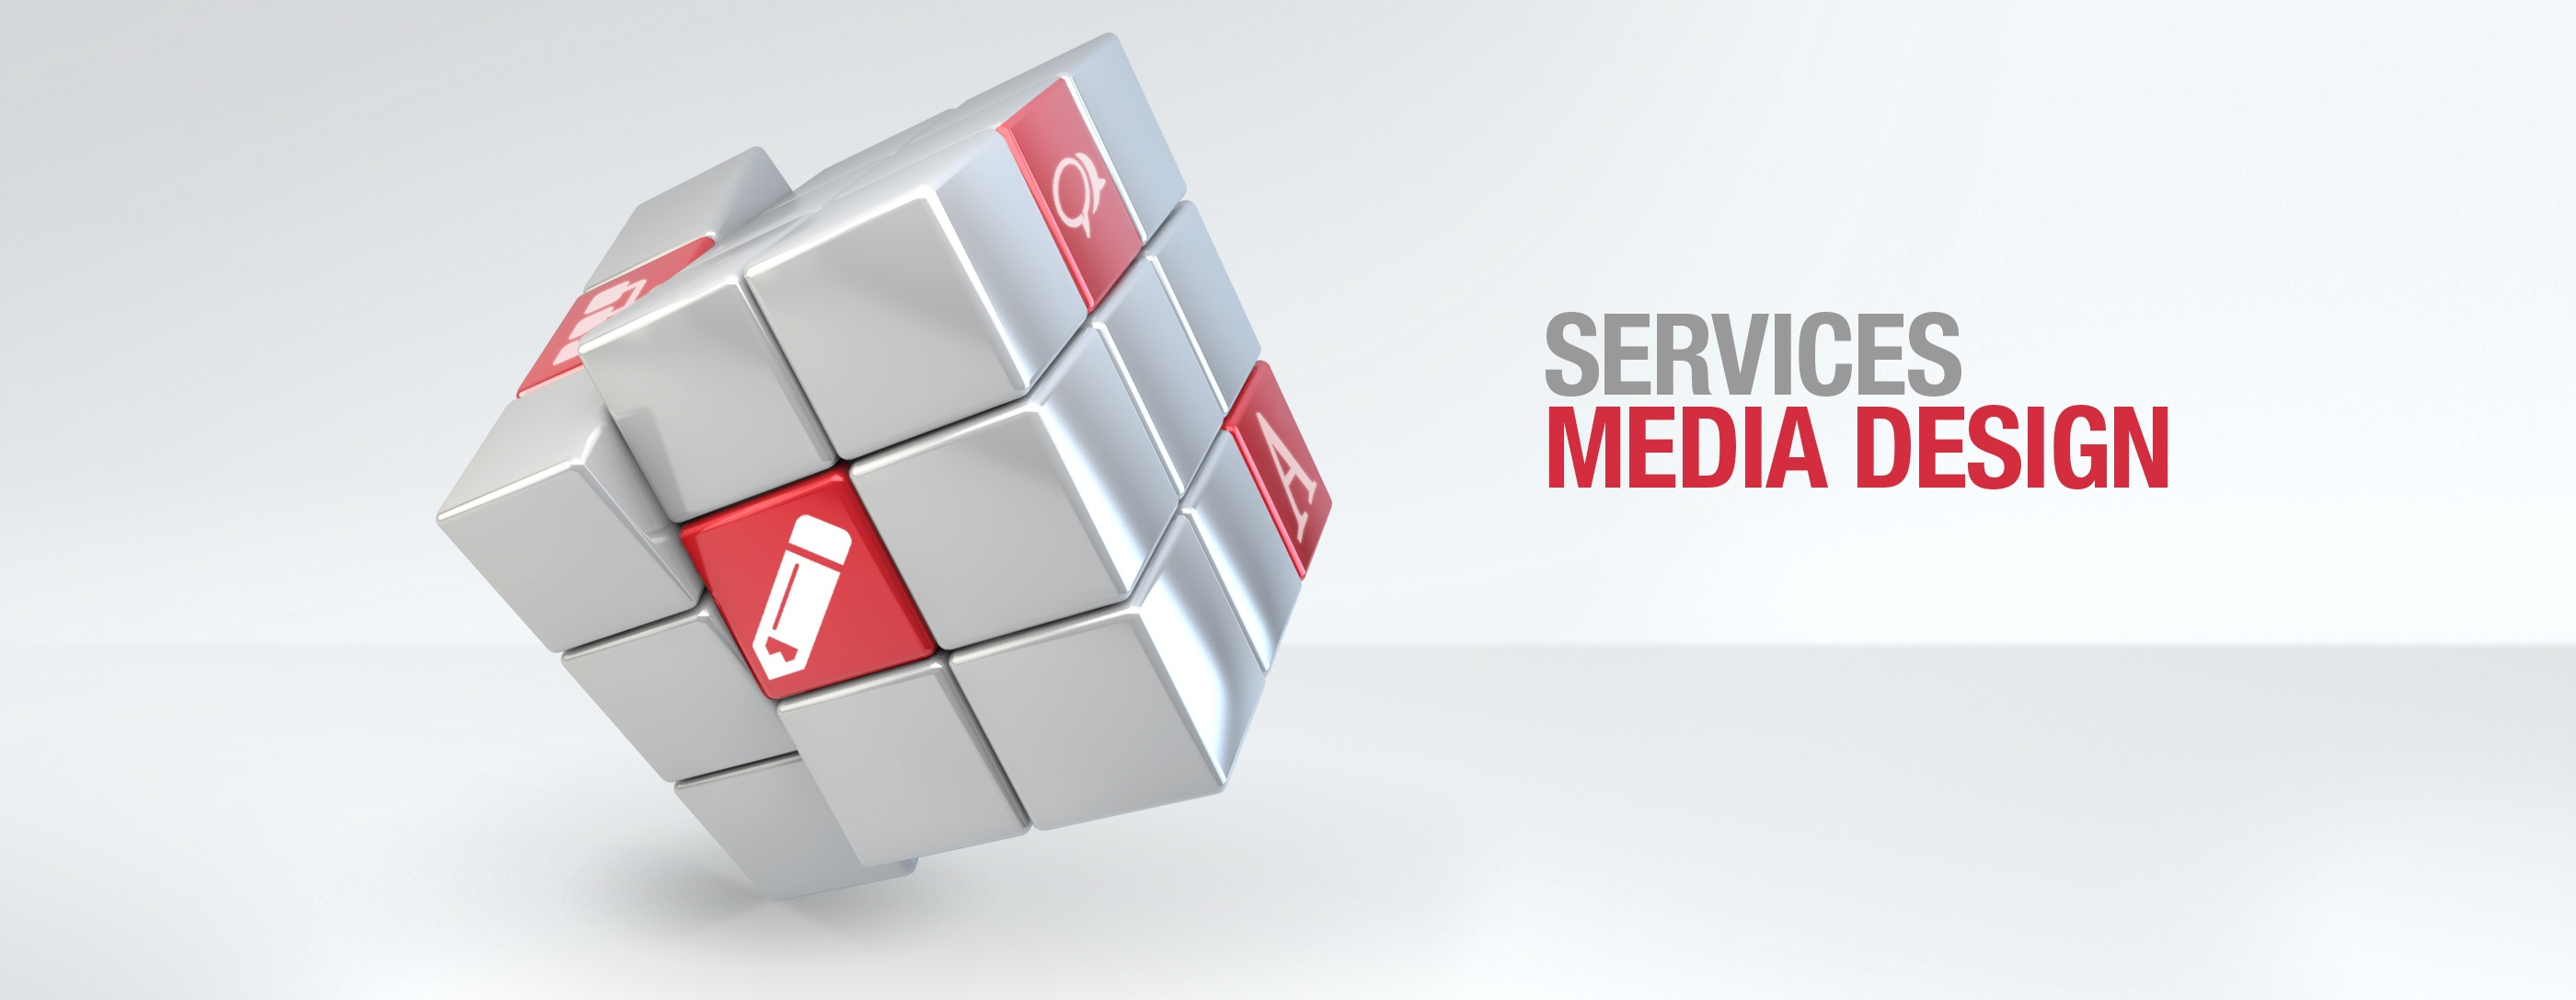 140408_Leistungen_Mediadesign_EN.jpg